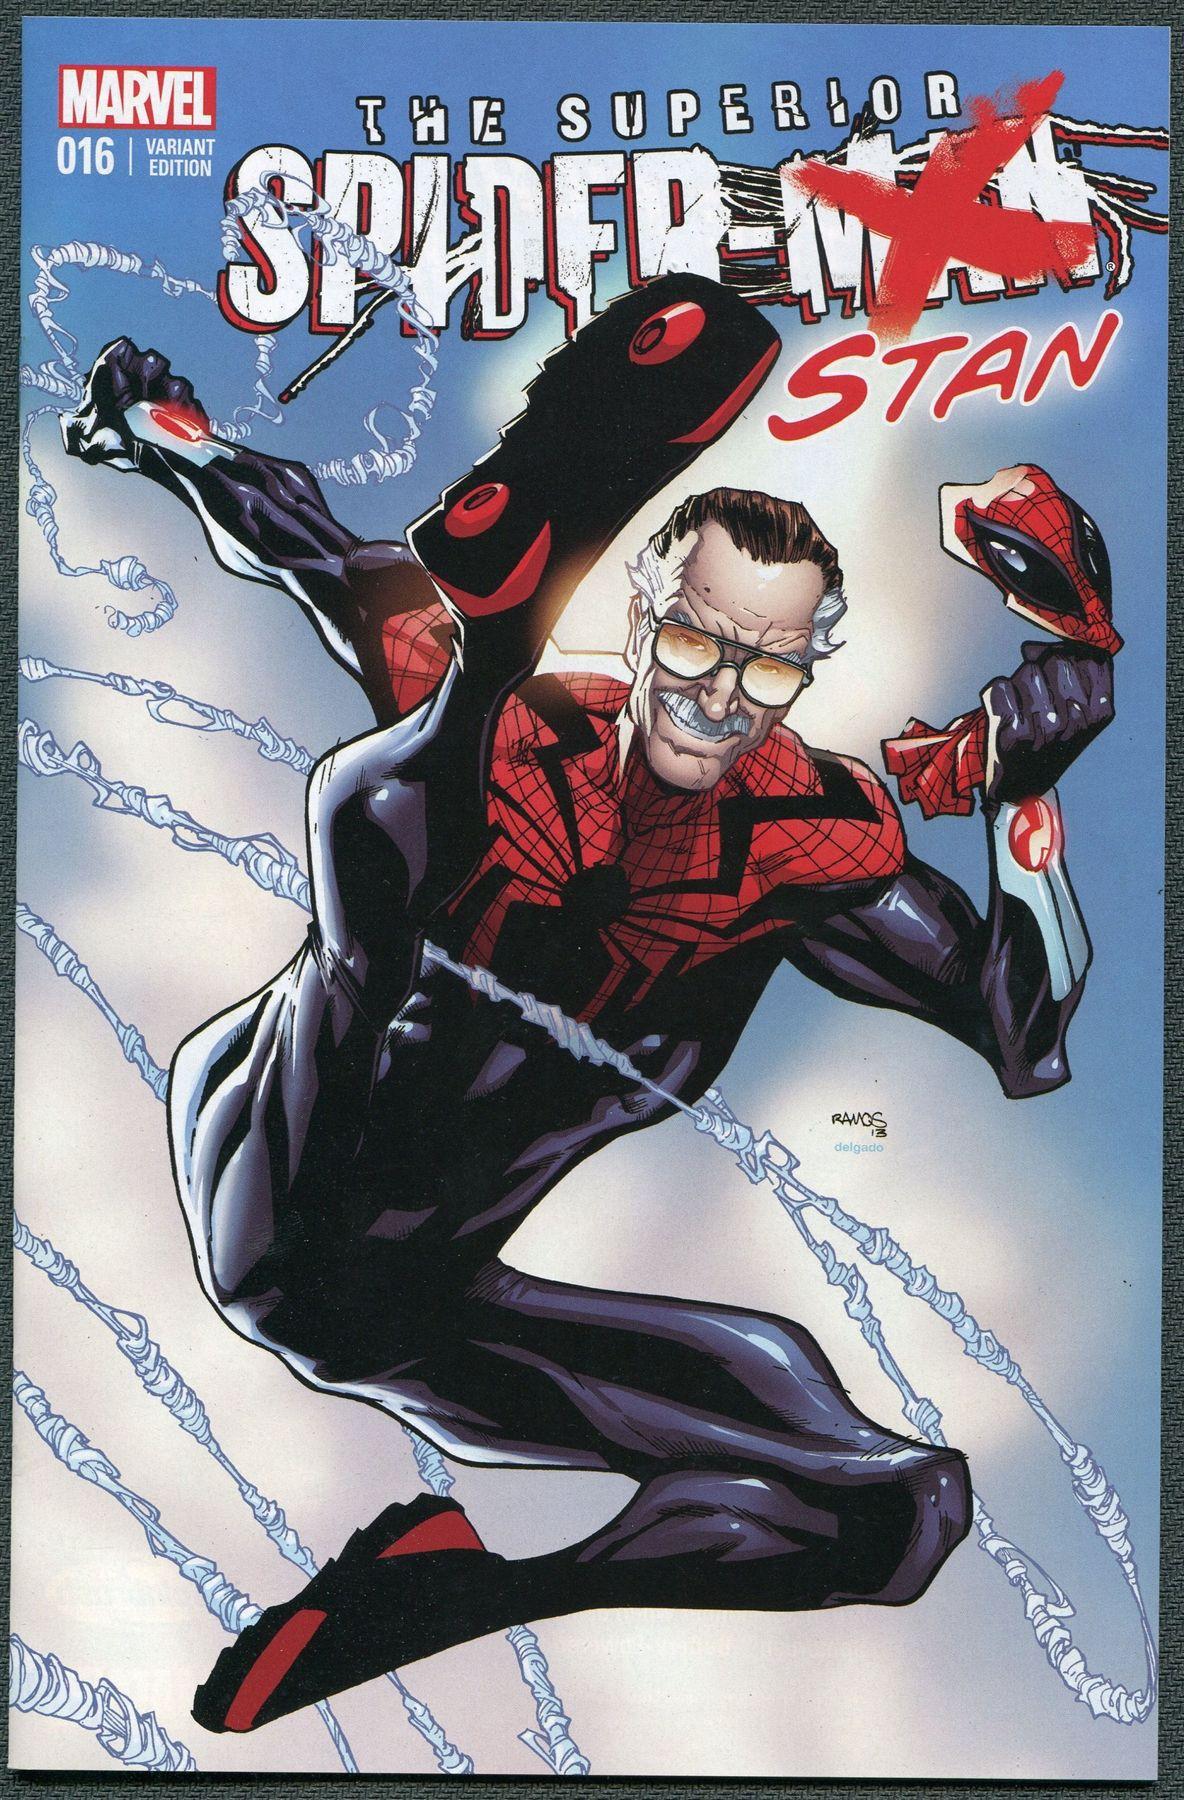 The Superior Spider Stan Humberto Ramos Spiderman